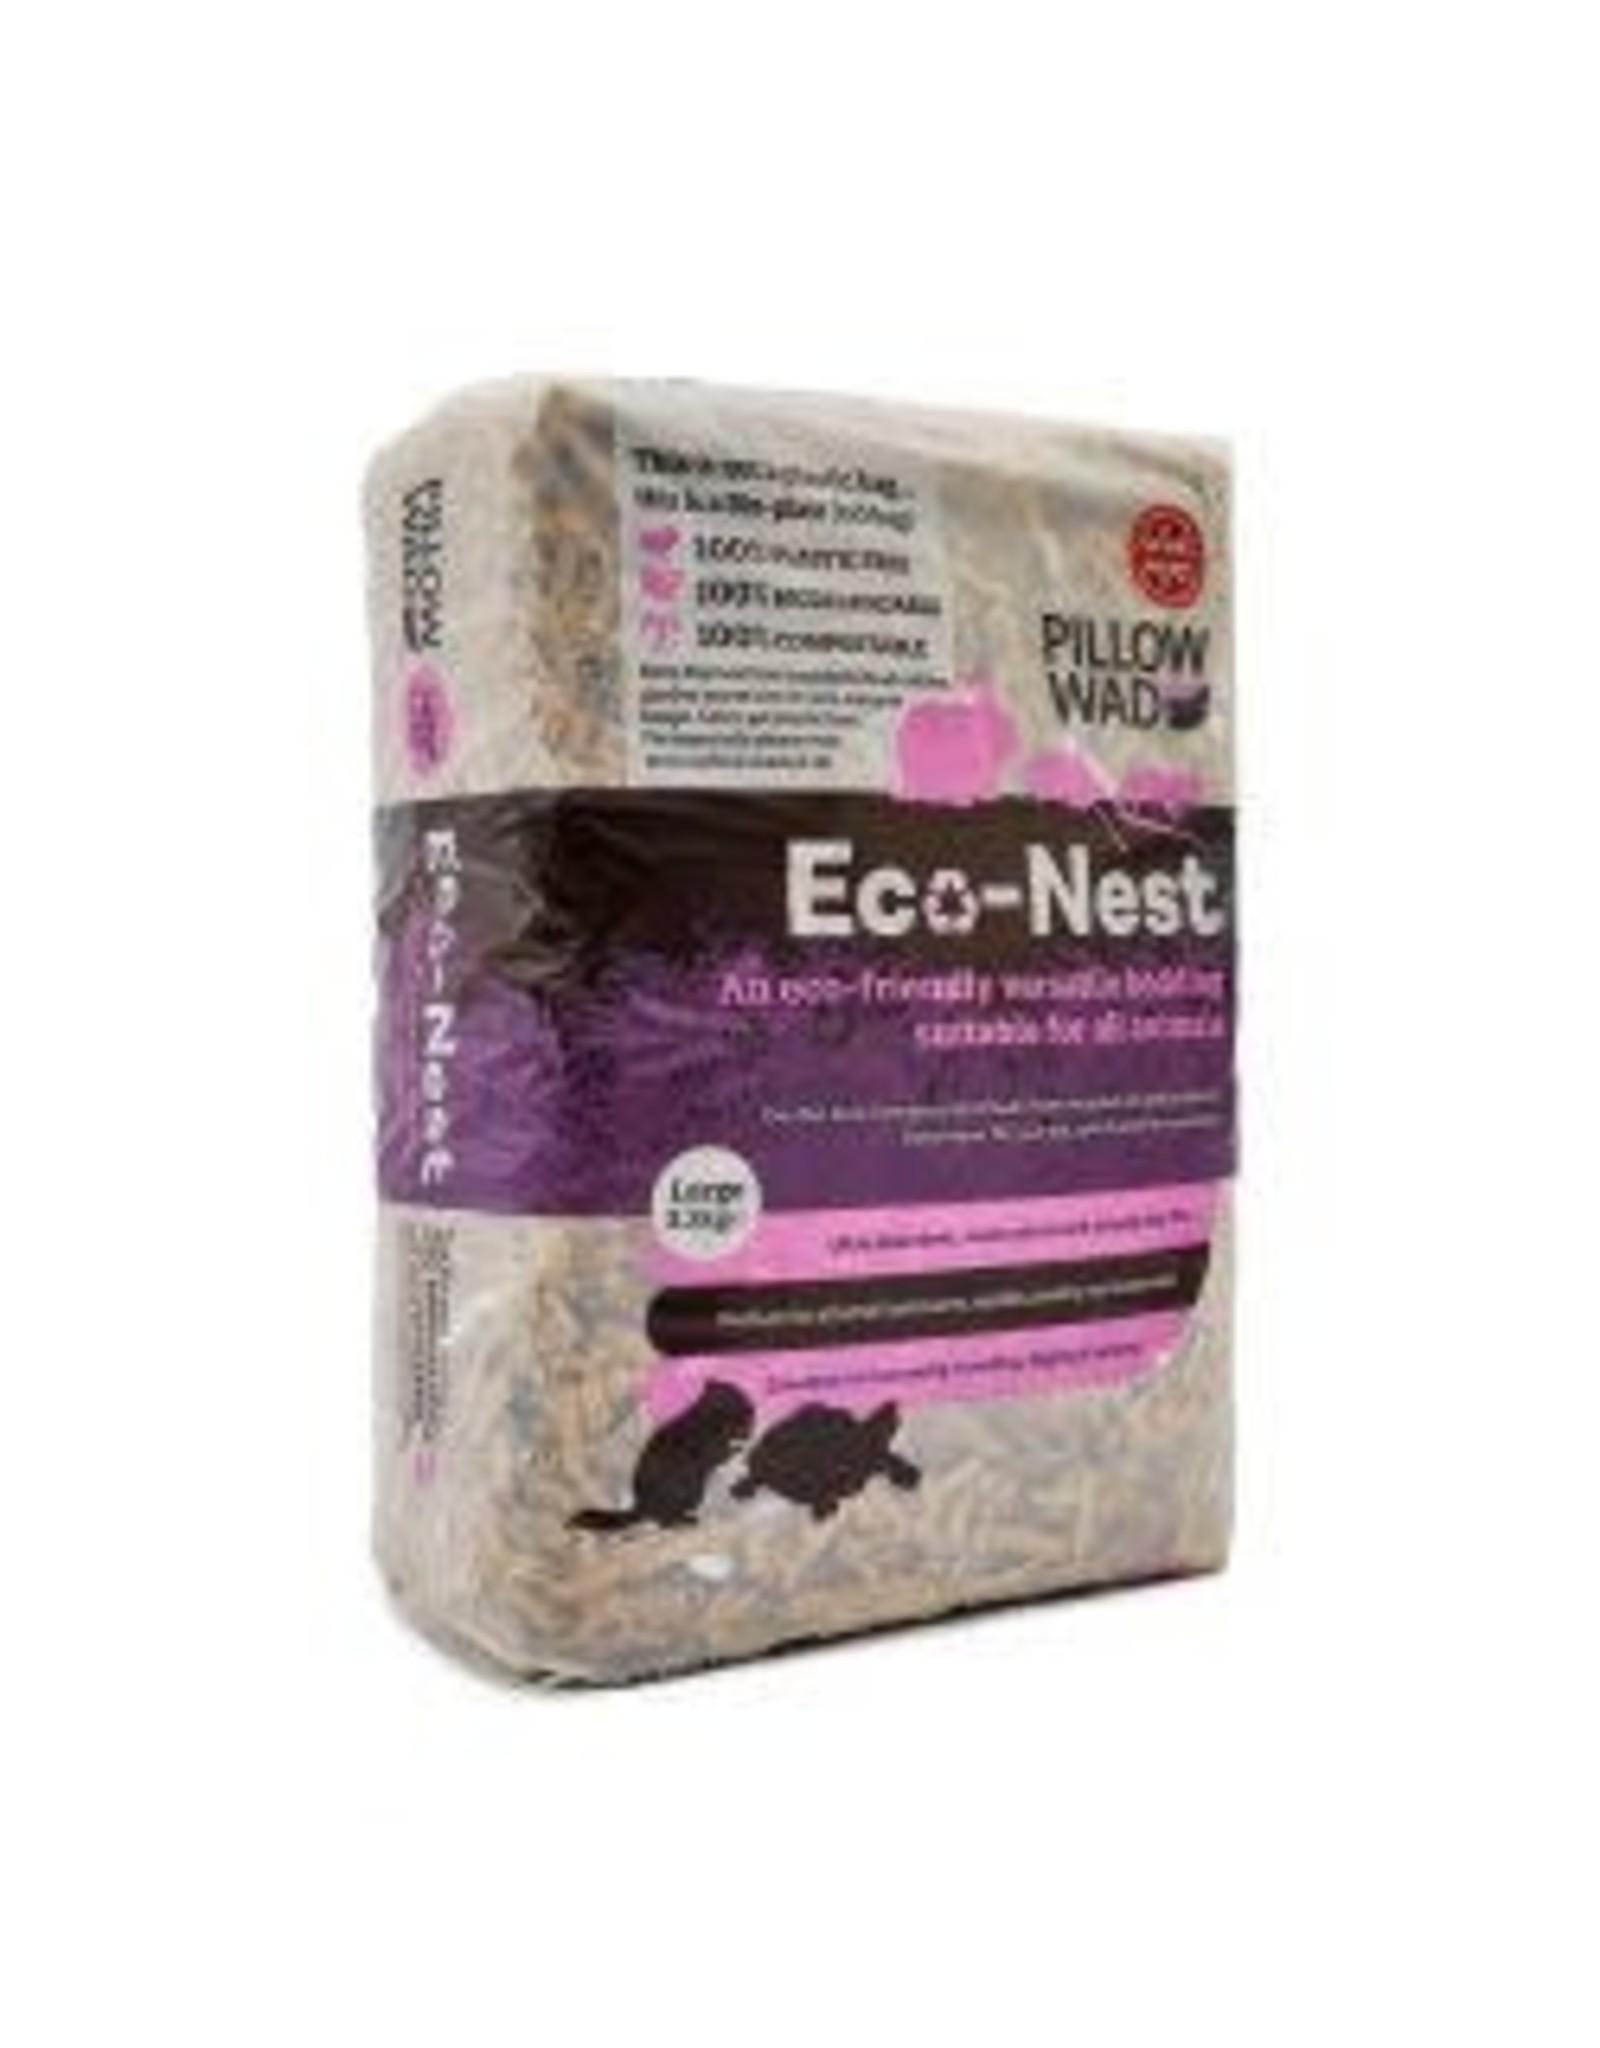 Pillow Wad Pillow Wad BIO Eco Nest 3.2kg